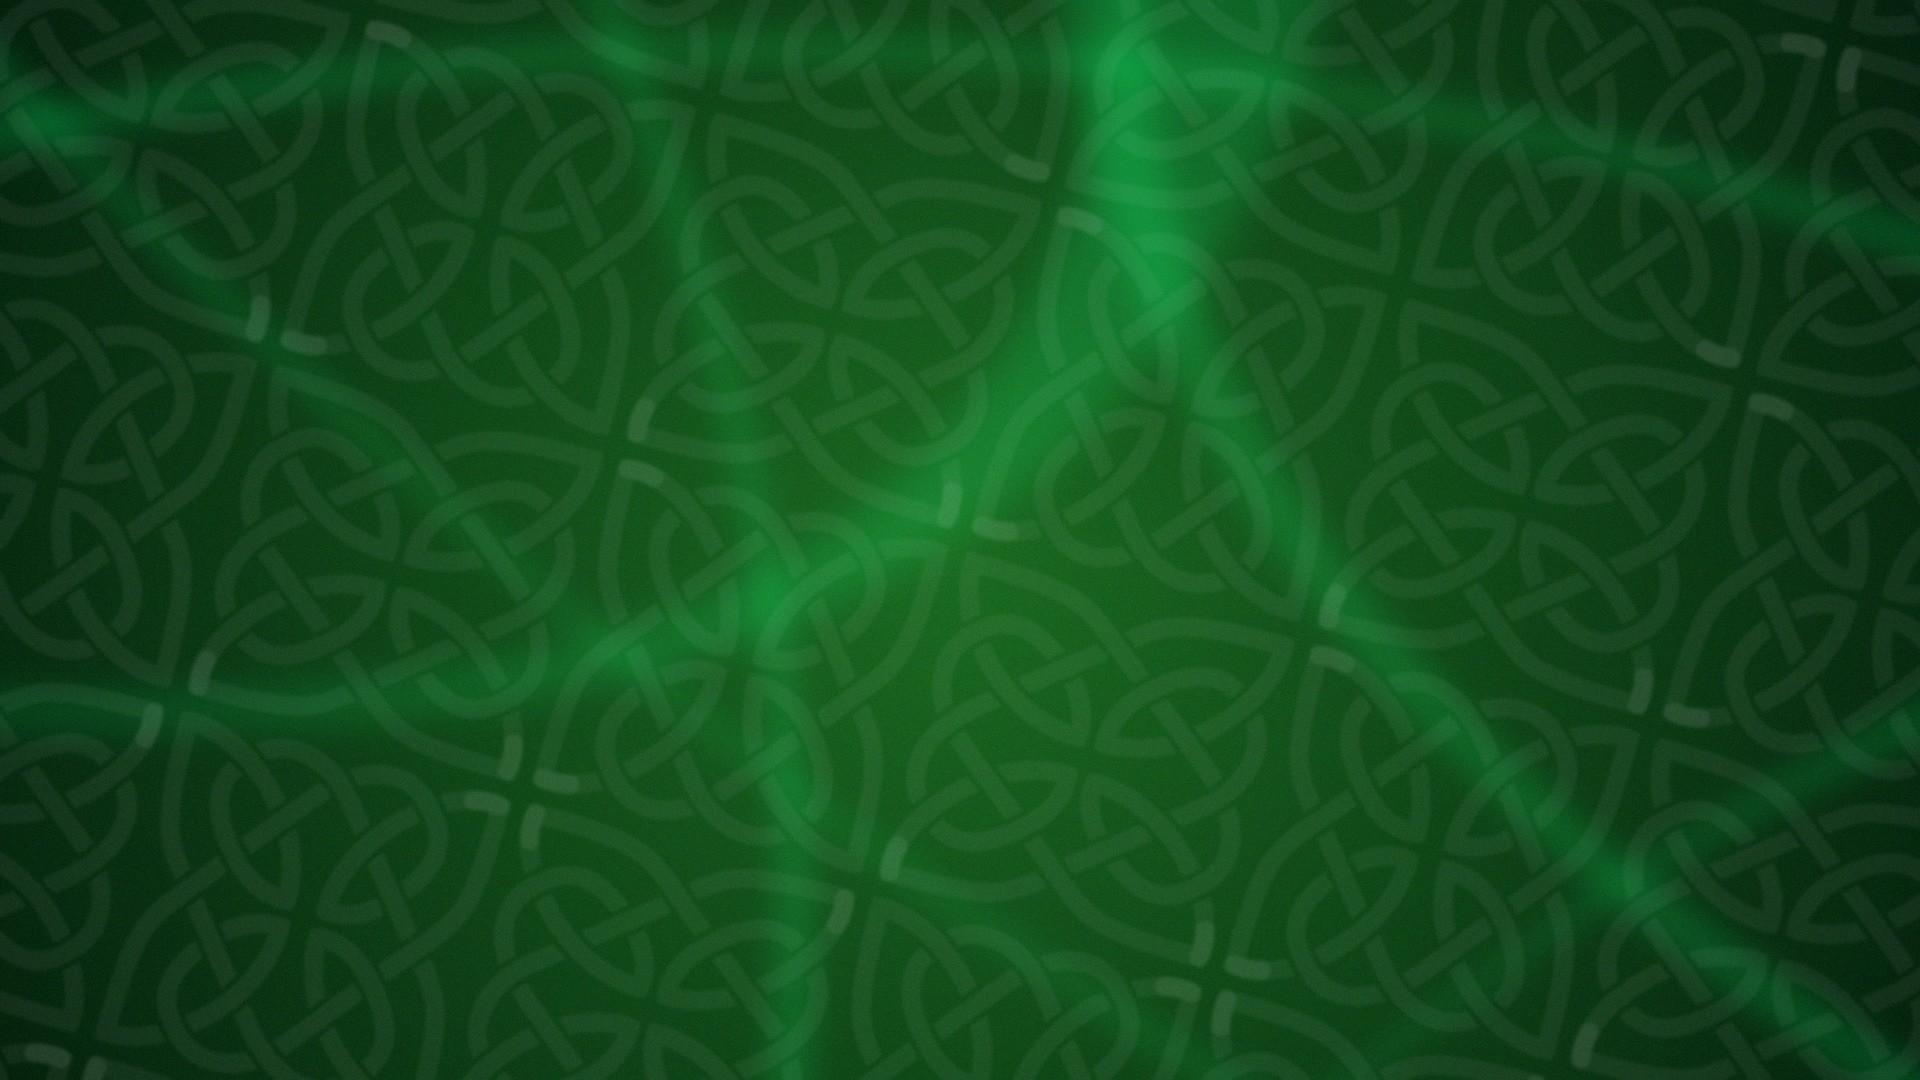 Celtic Knot Backgrounds (33+ images)